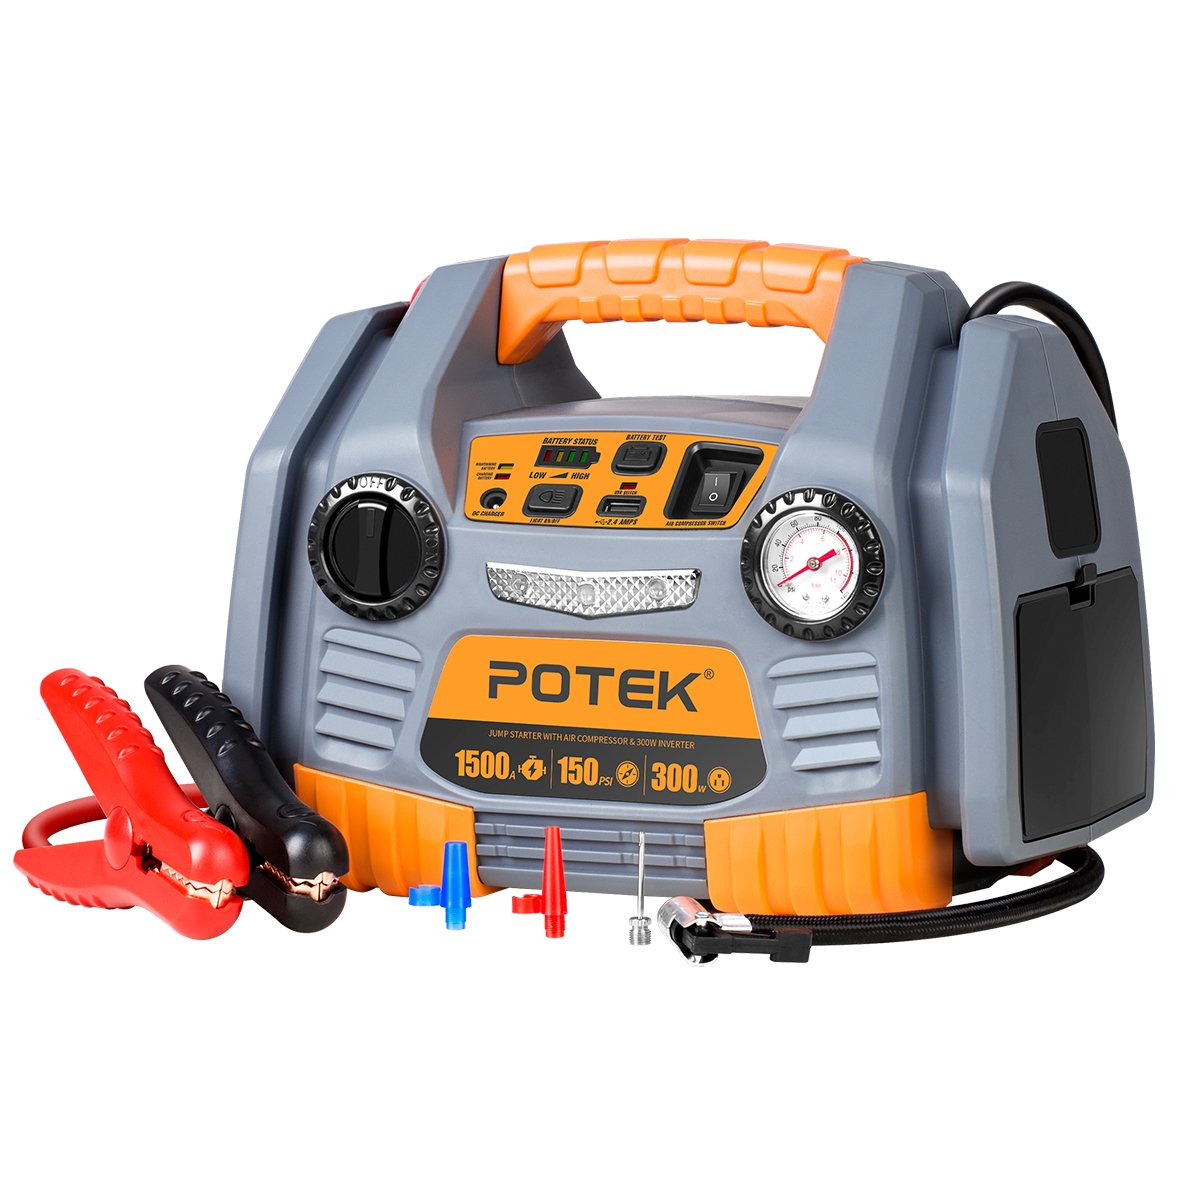 POTEK Portable Power Source Compressor